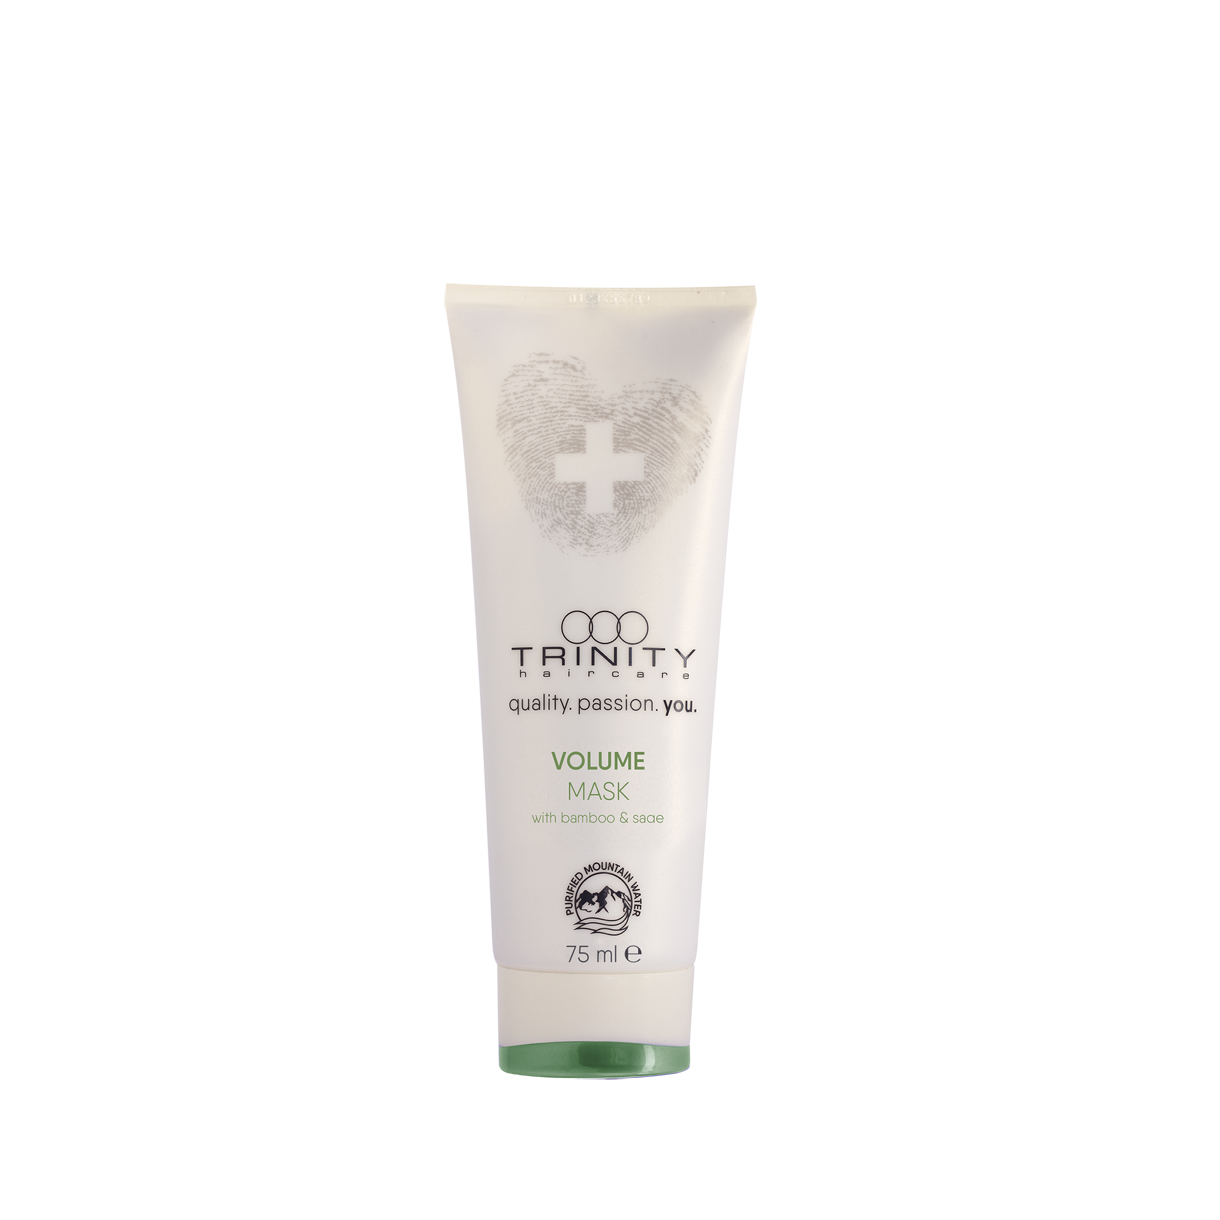 Фото - Trinity Hair Care Маска Essentials Volume Mask для Объема, 75 мл trinity hair care маска essentials summer mask с уф фильтром 200 мл